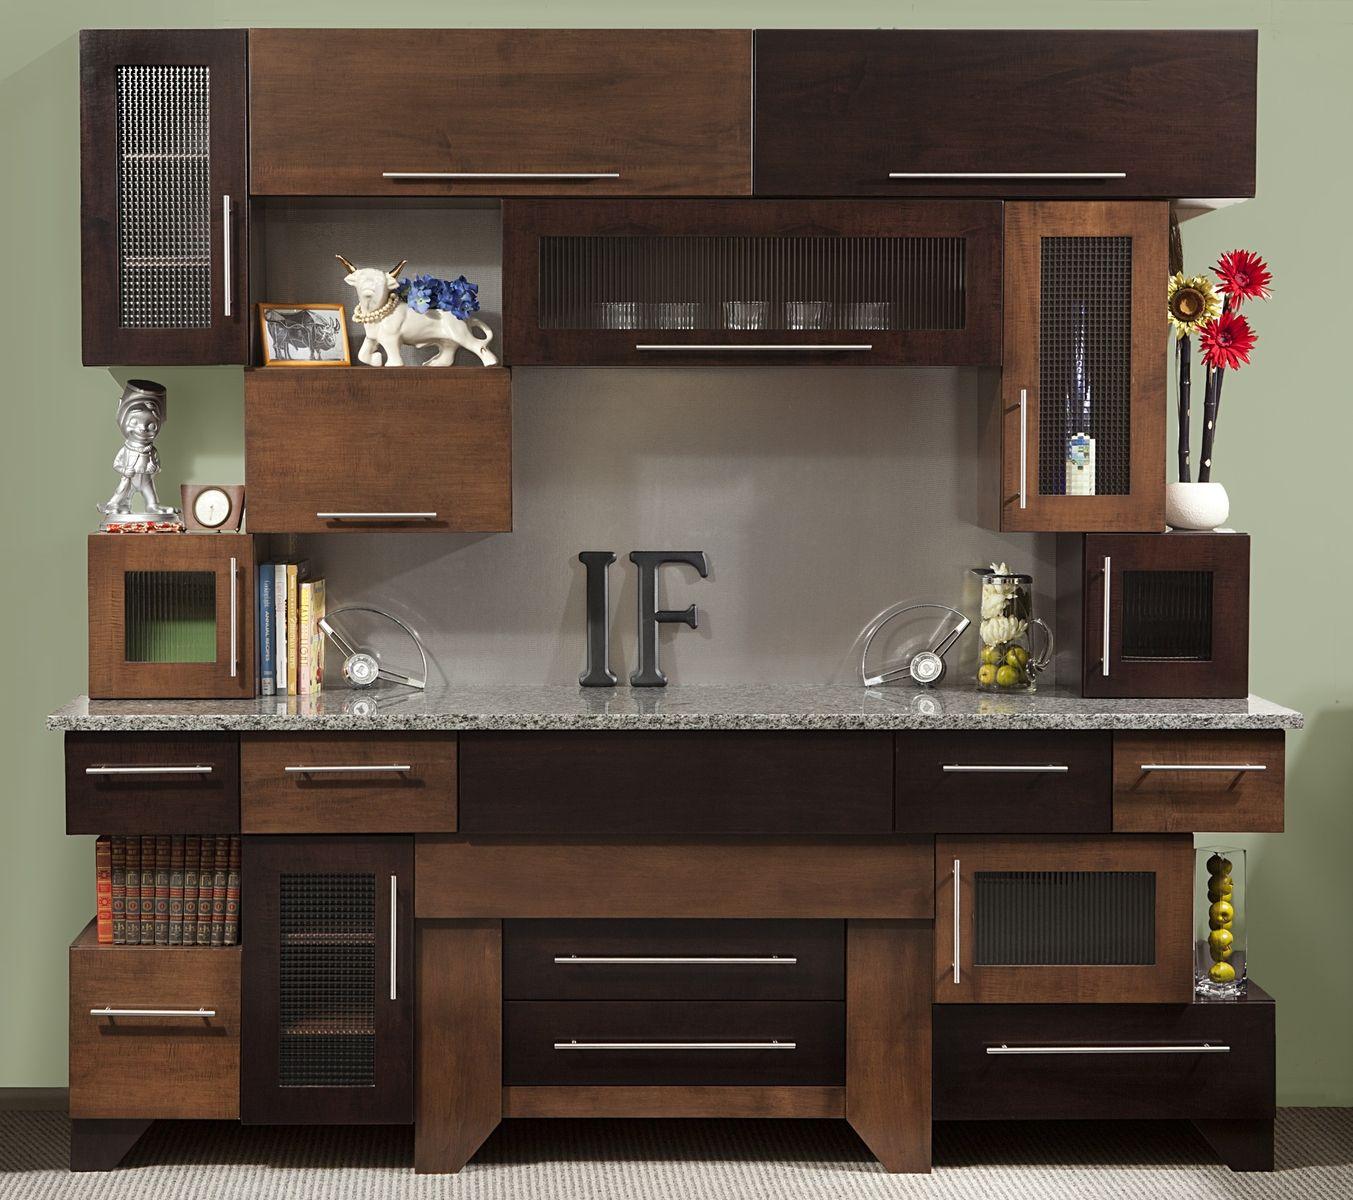 Hand Made Cubist Cabinets Kitchen Modern Clean In Tiger